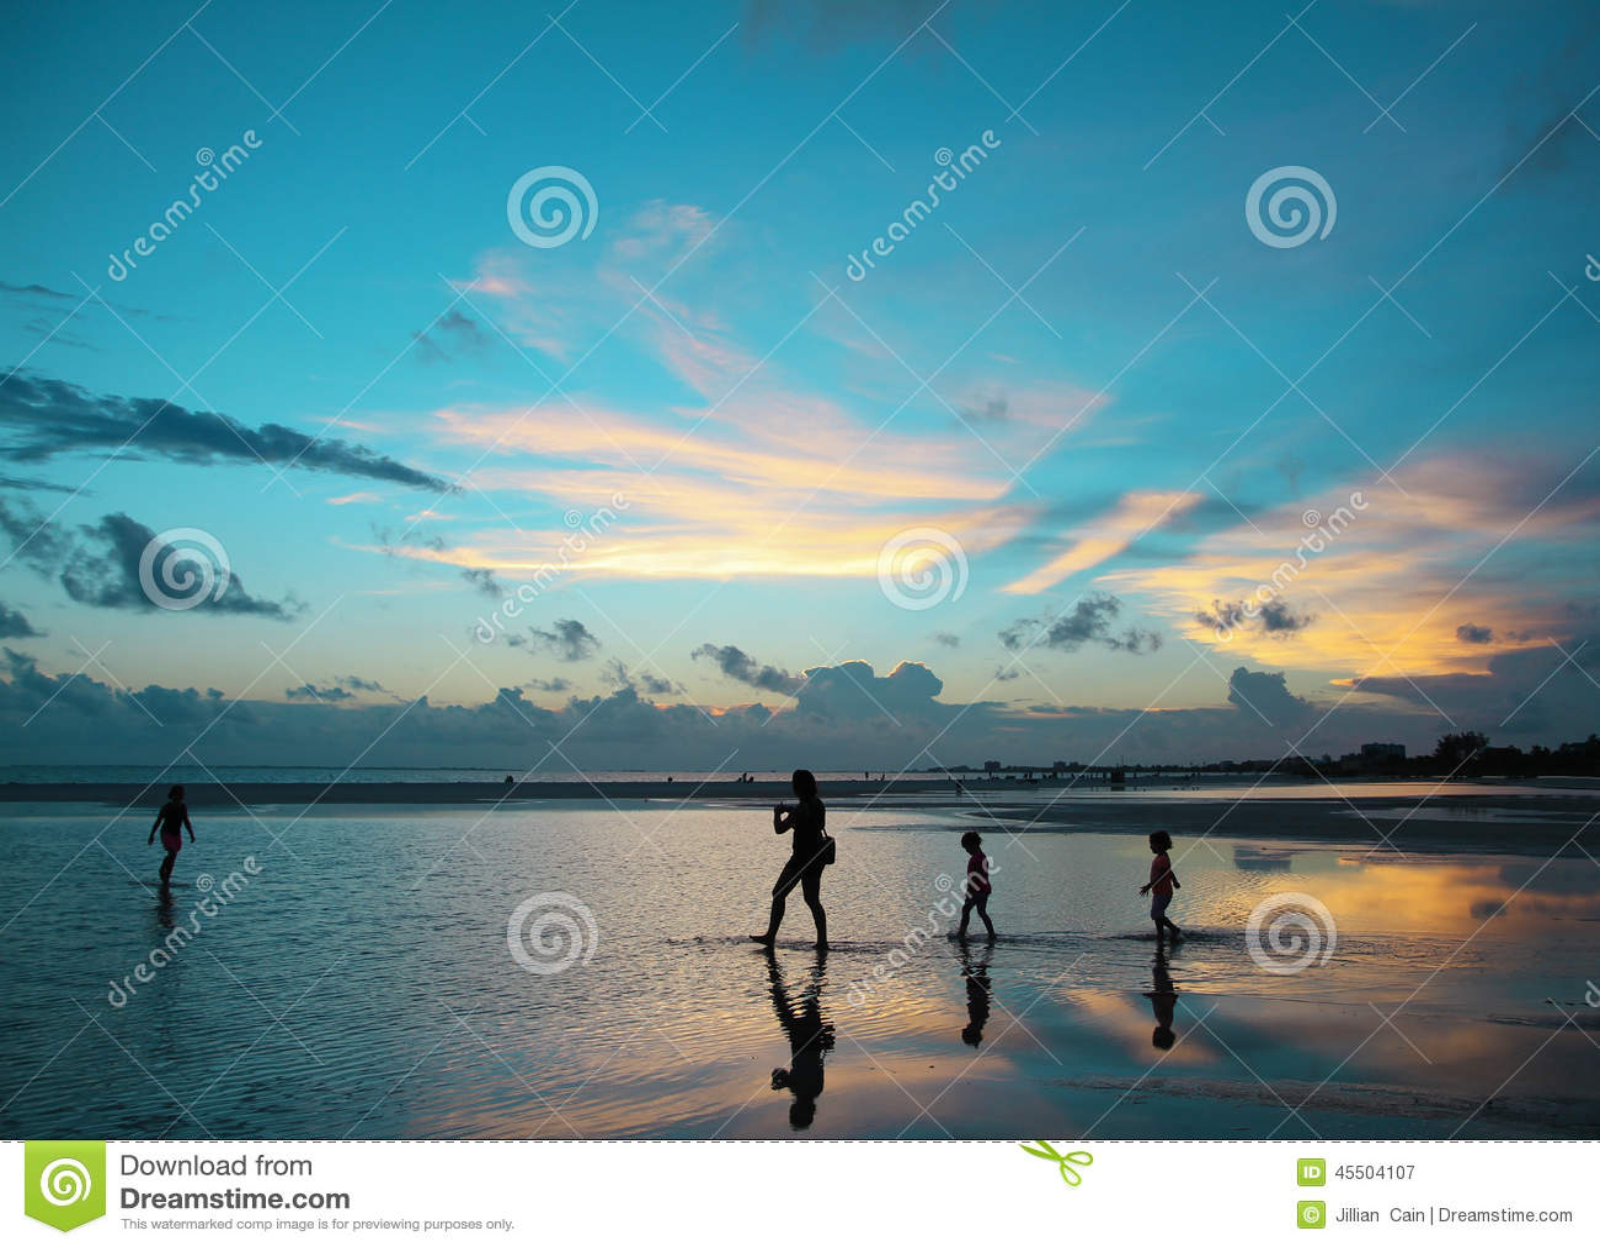 A family enjoying a dramatic blue sunset